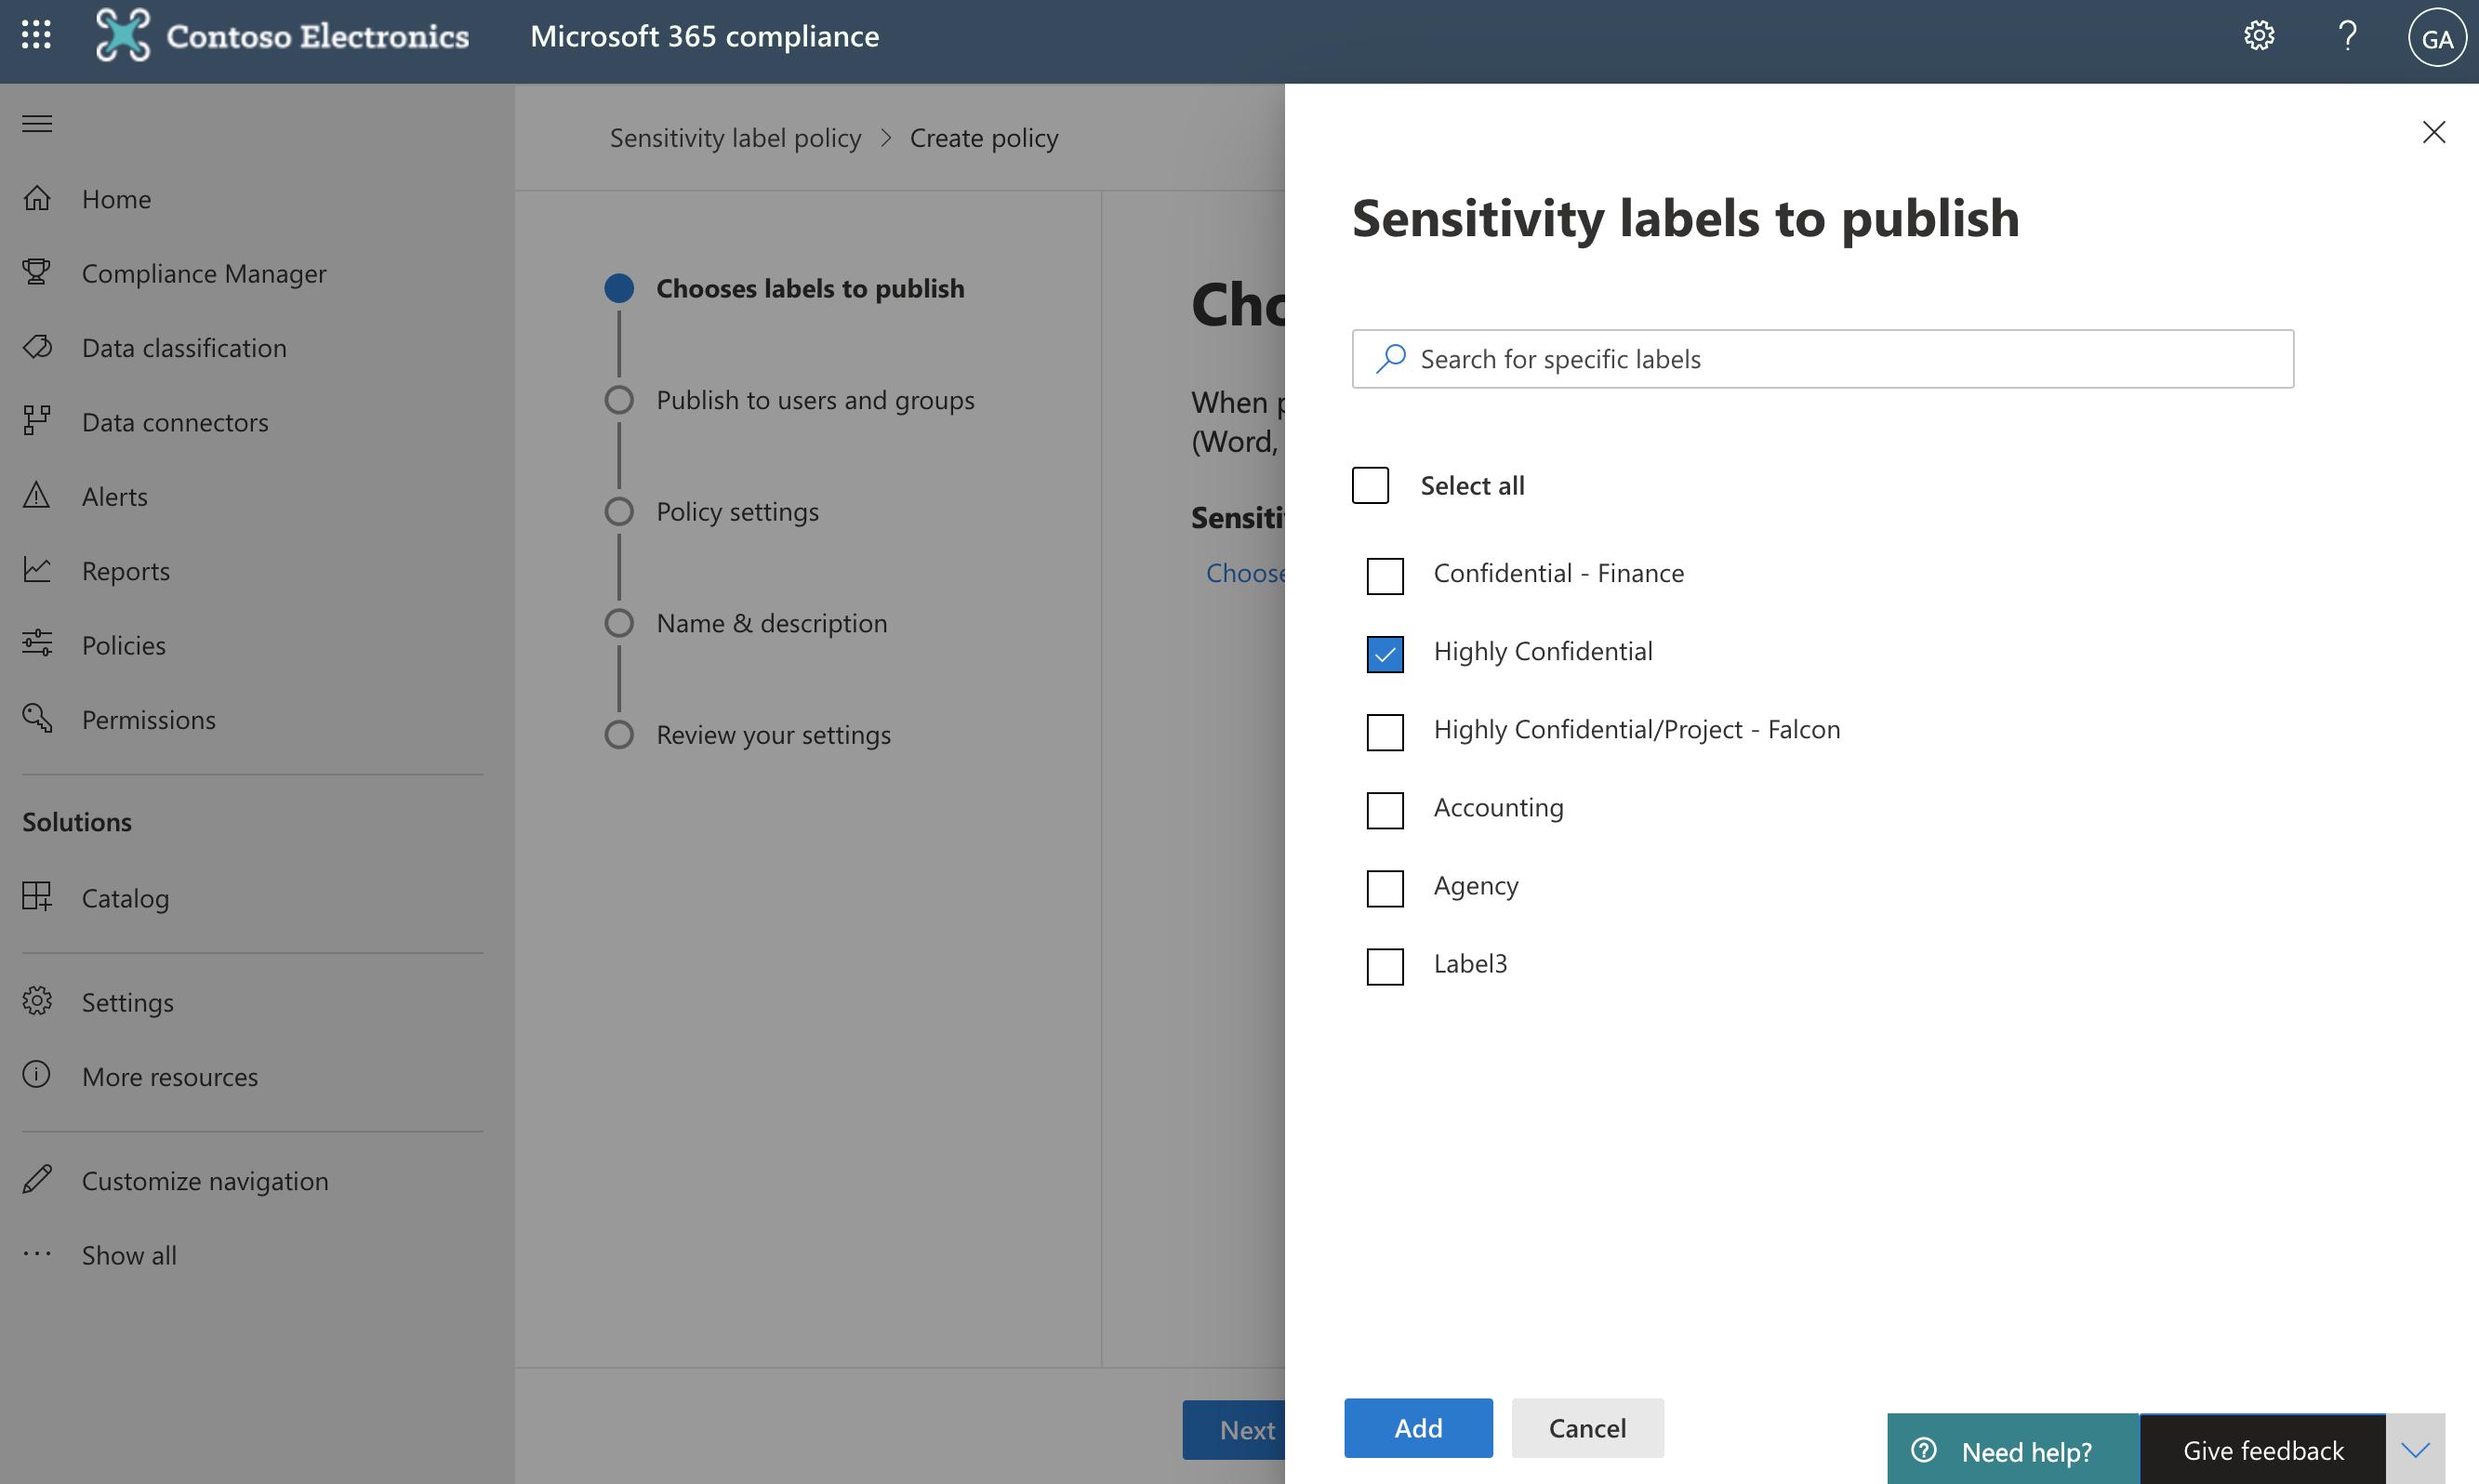 Screenshot of Sensitivity labels to publish screen.